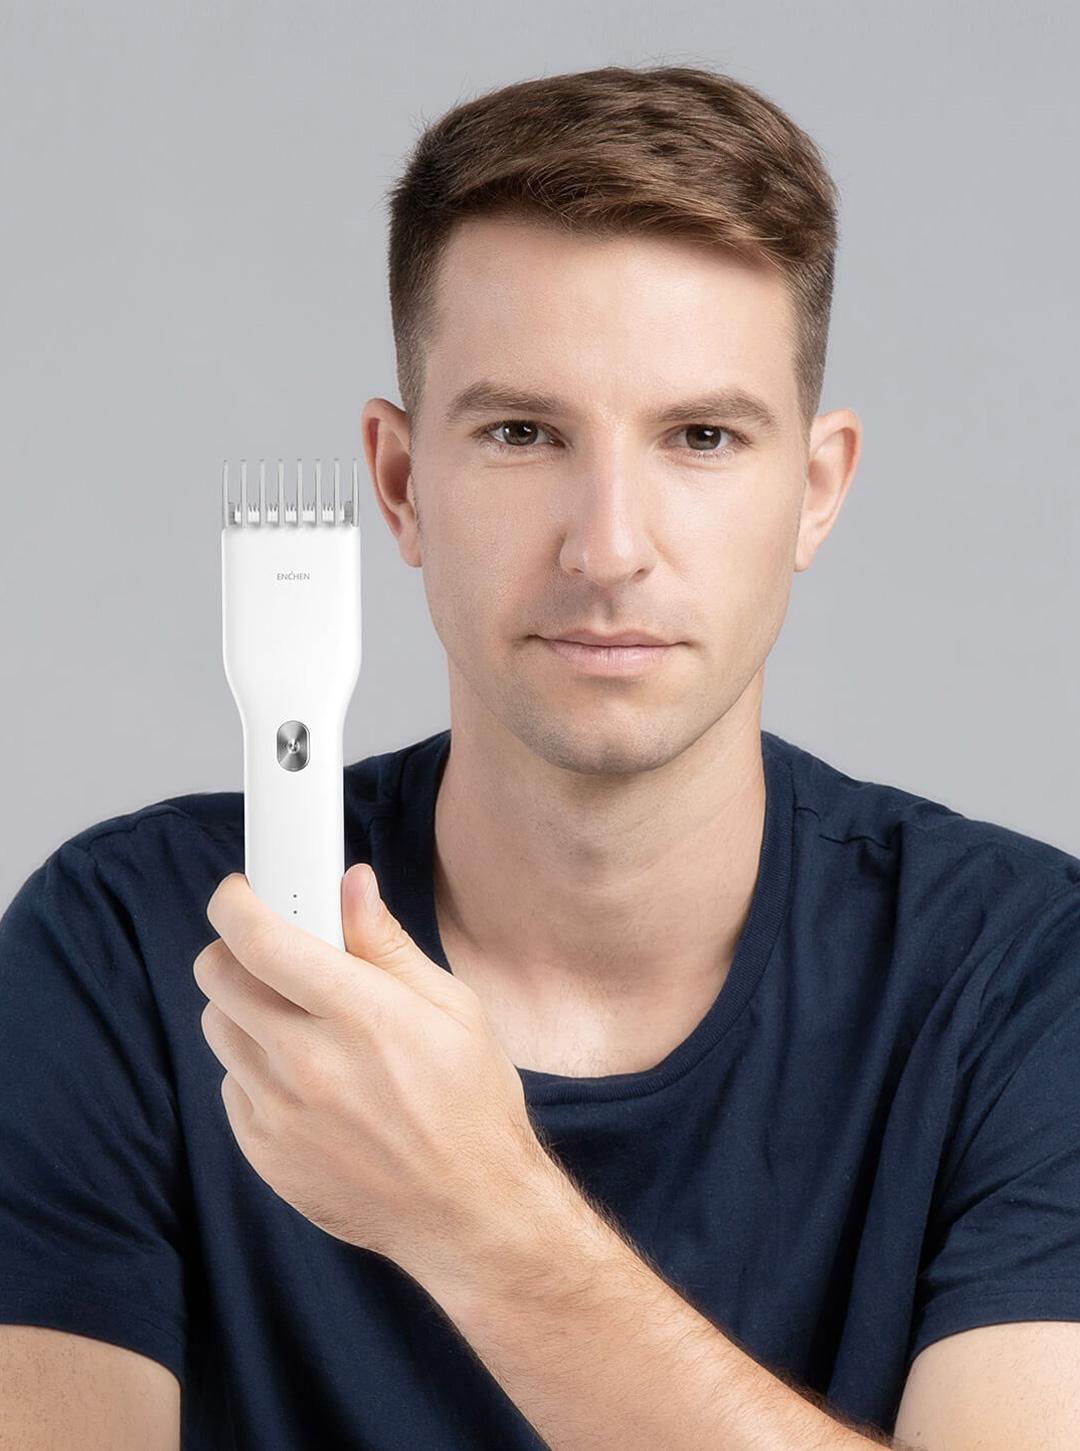 Enchen Boost Electric Hair Clipper